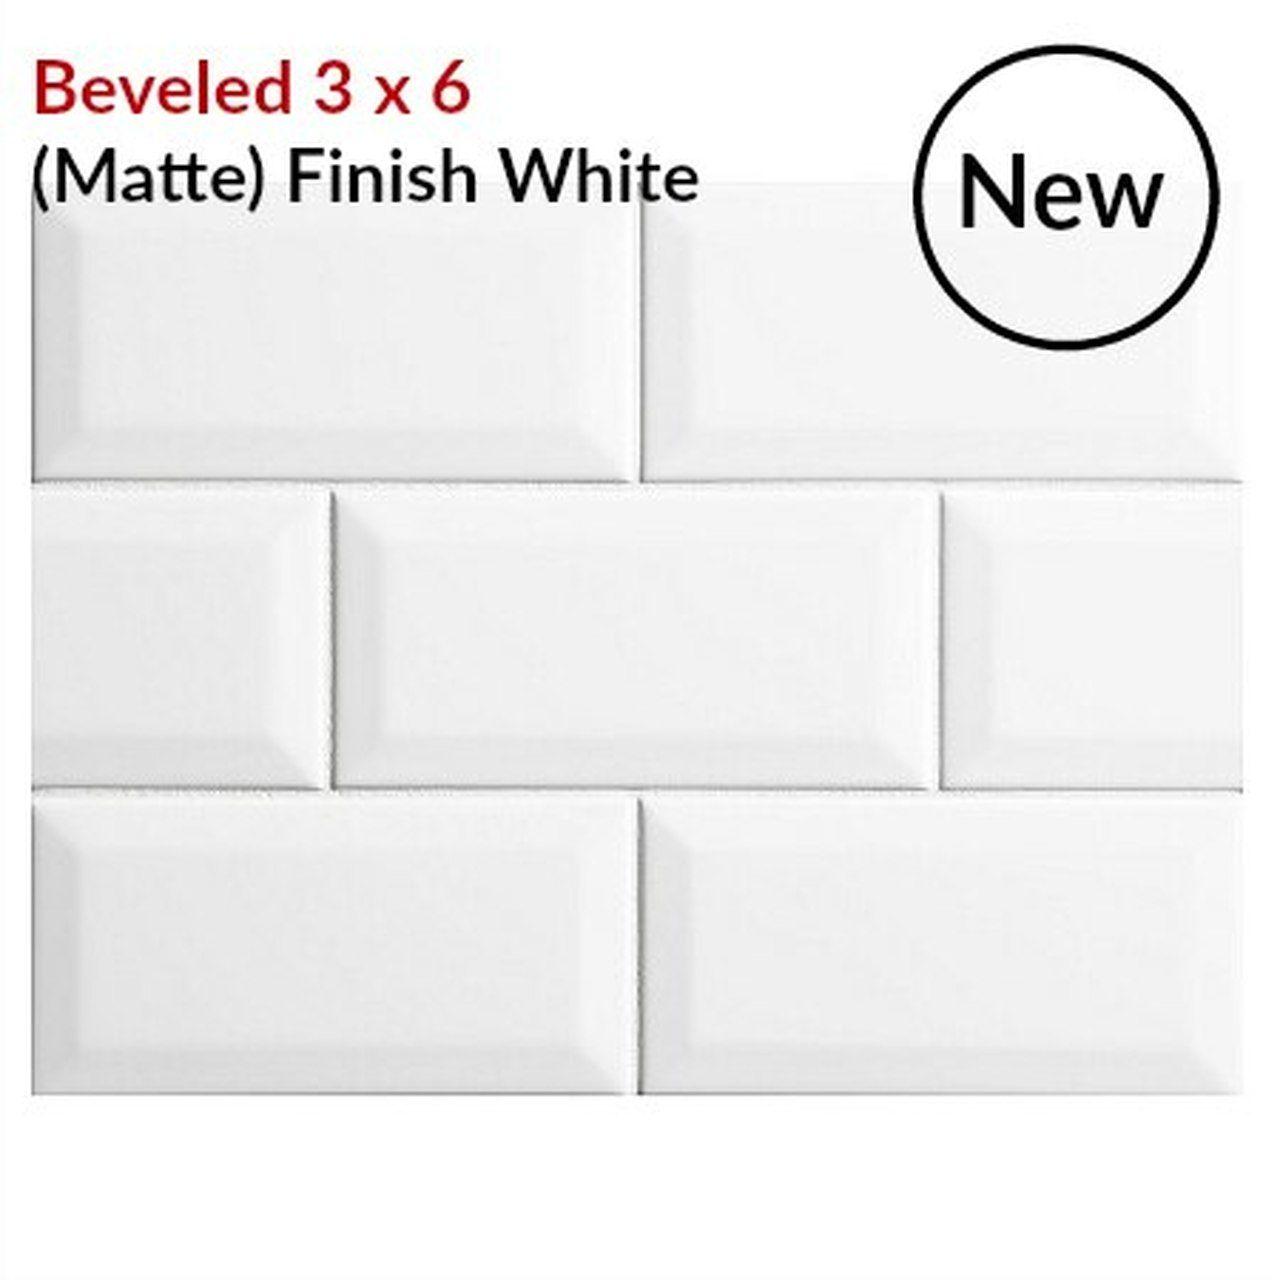 Metro Subway Beveled Tile 3 X 6 Matte Finish White Ceramic Wall Tile 3 59 Per Square Foot In 2020 Beveled Subway Tile White Subway Tile Kitchen White Subway Tiles Kitchen Backsplash